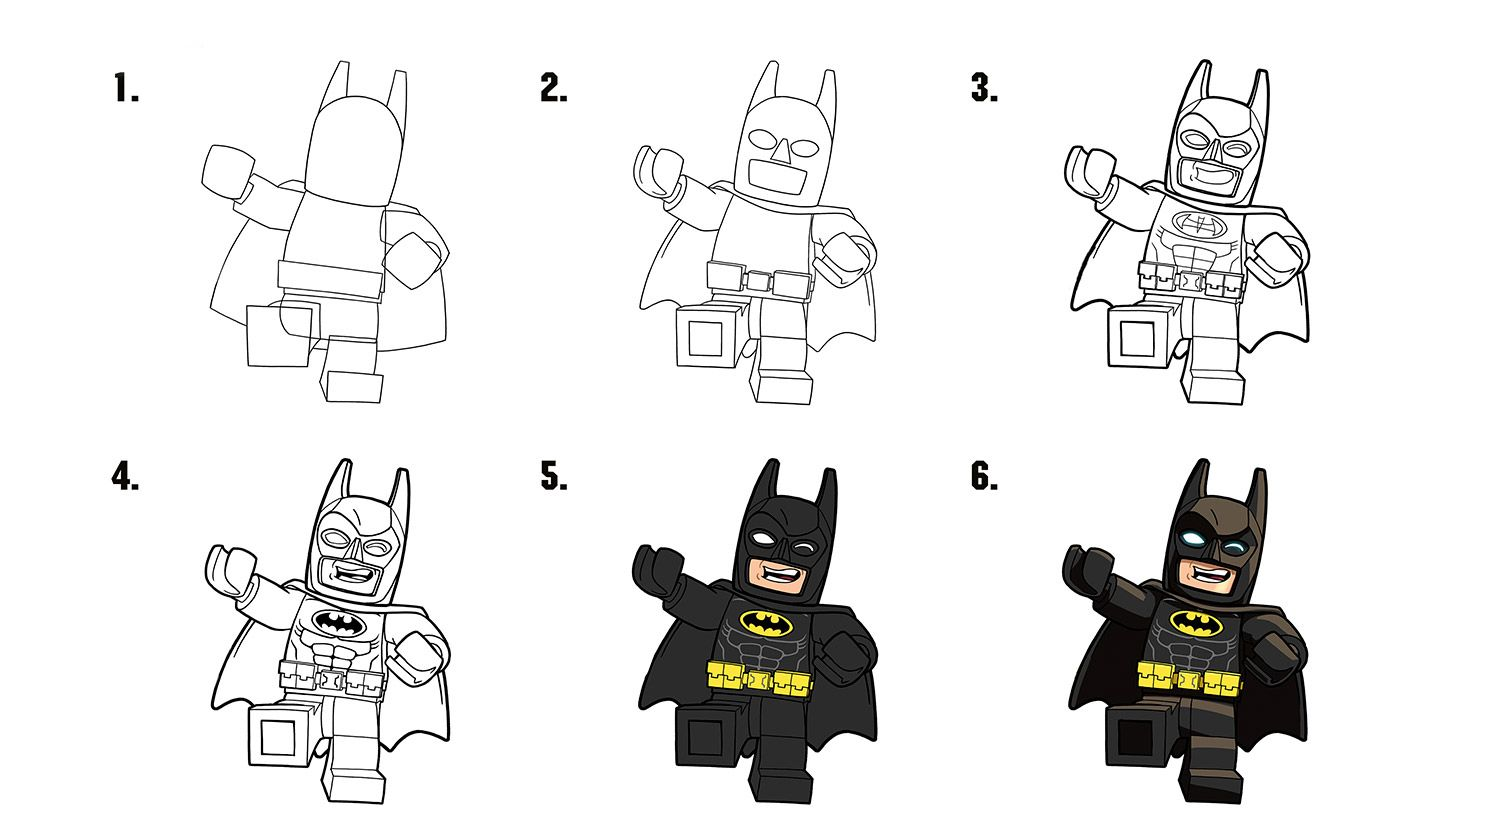 How to draw Batman | The LEGO Batman Movie | Pinterest